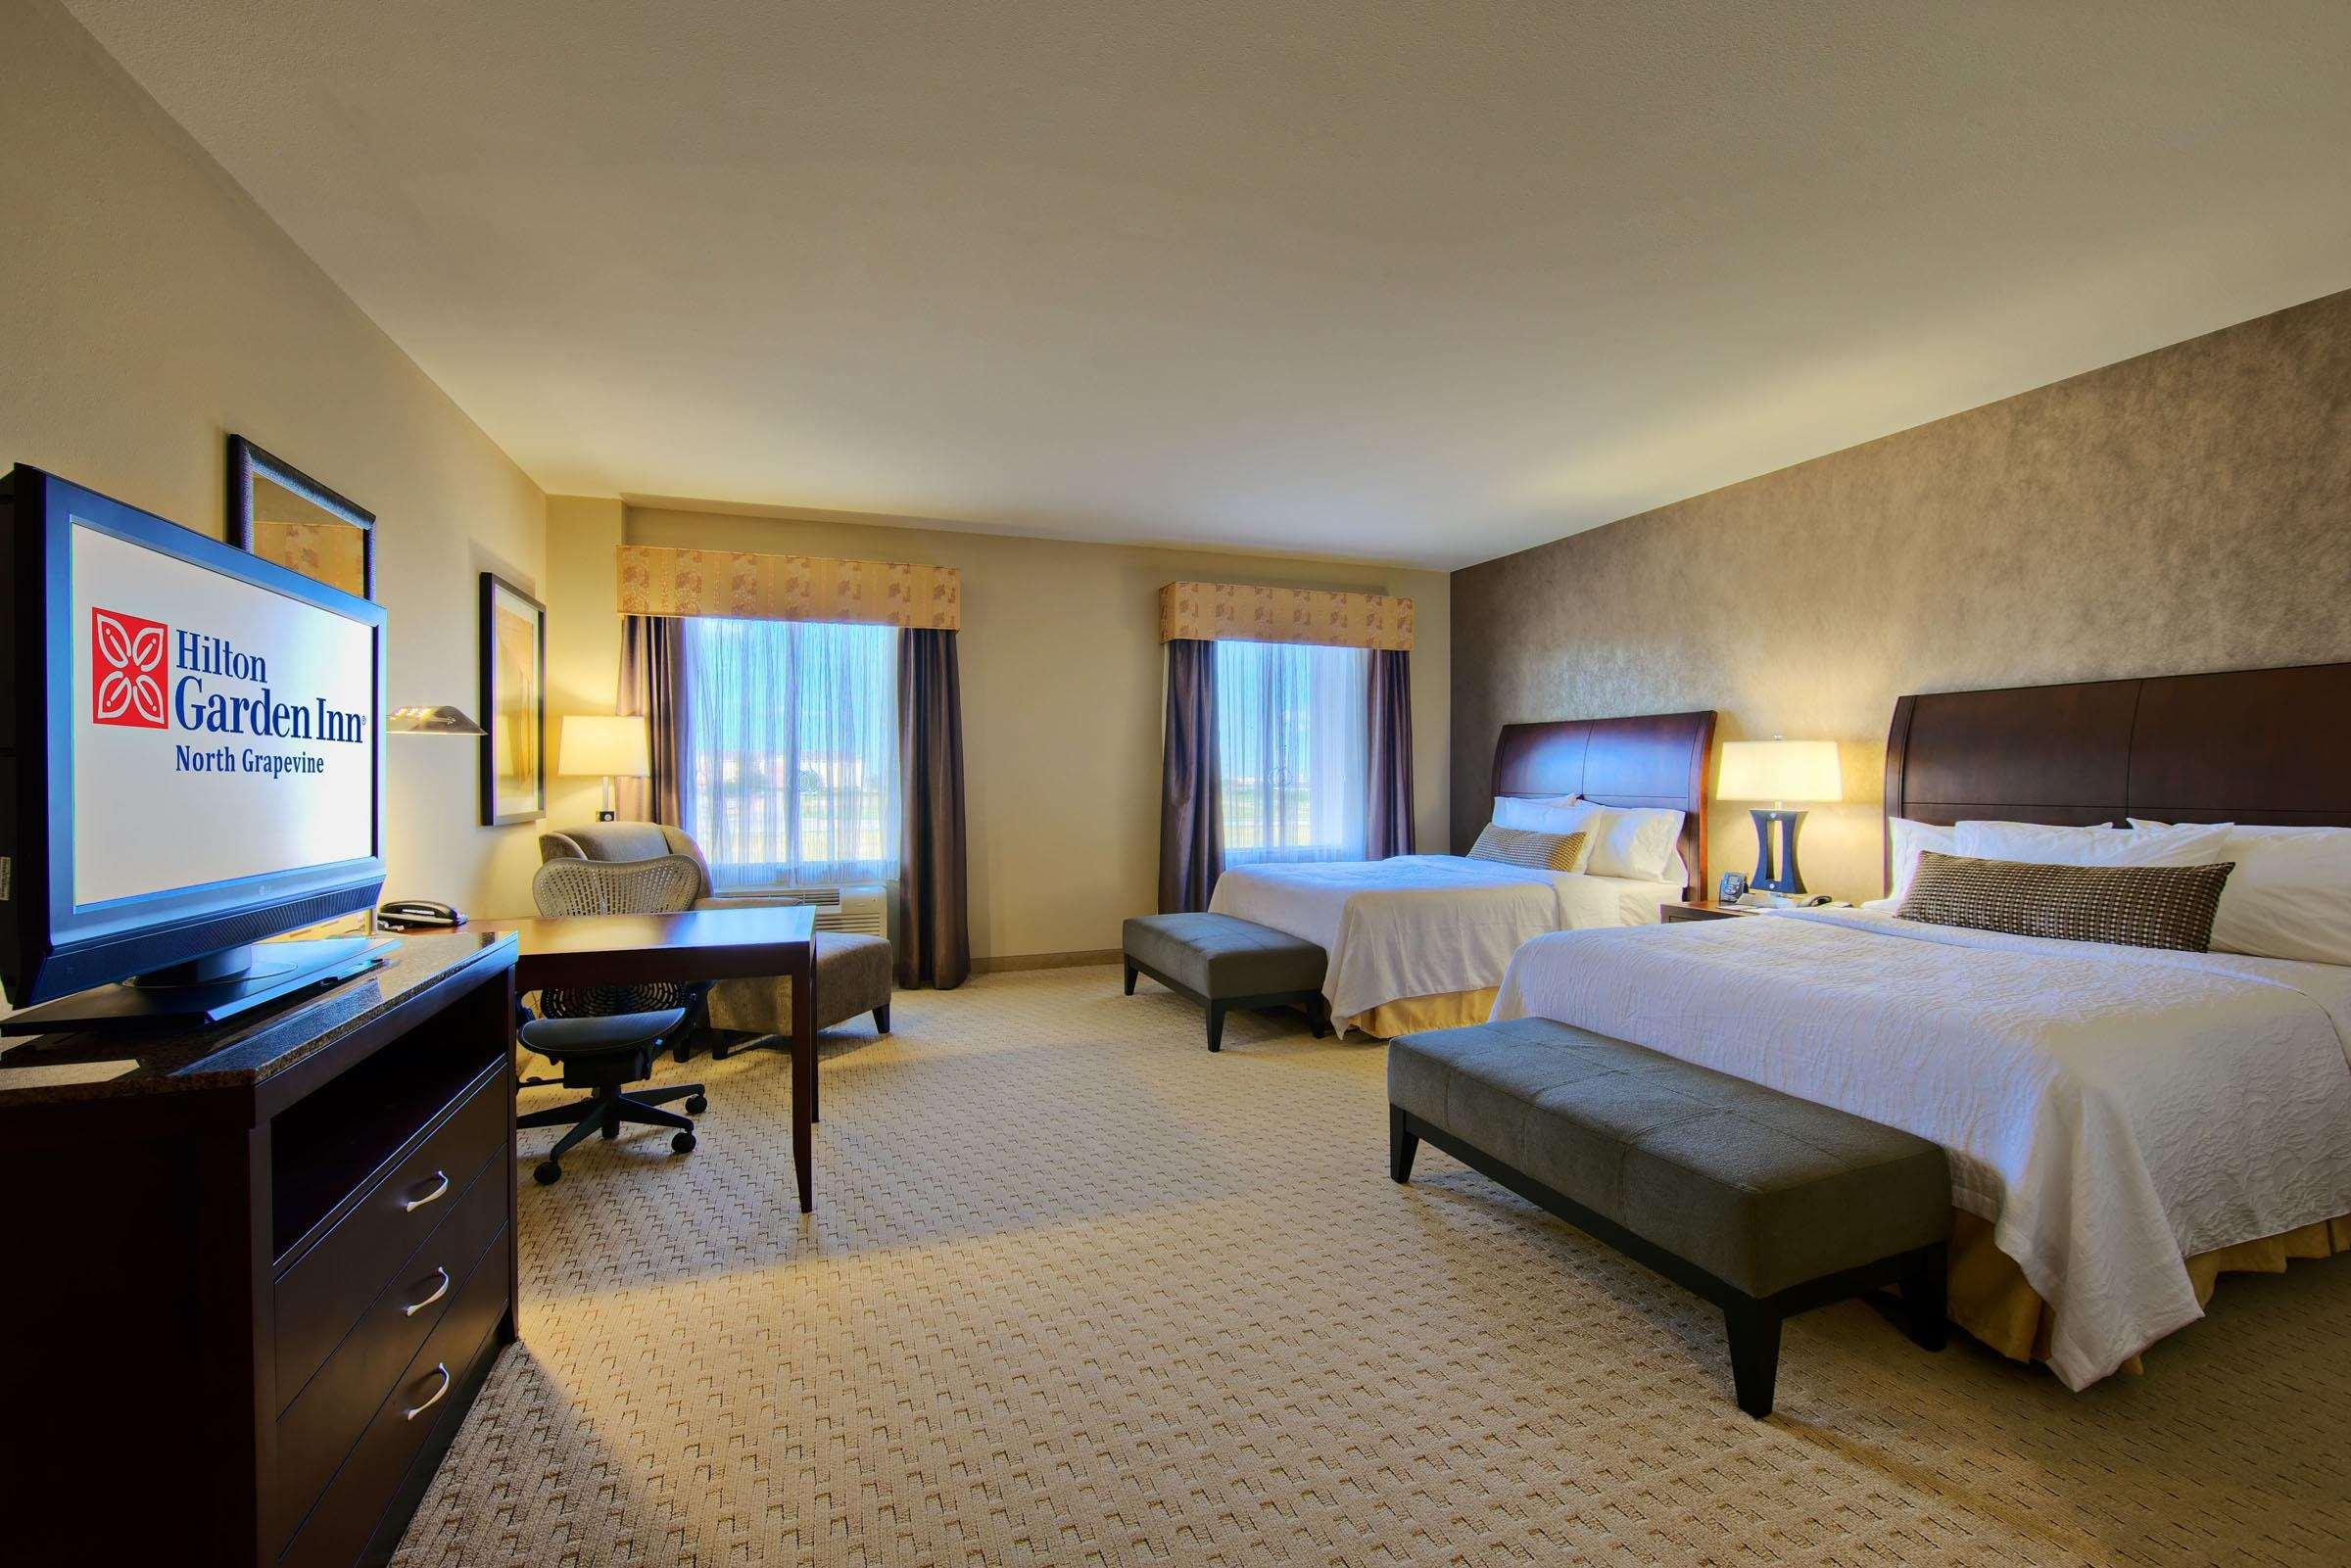 Hilton Garden Inn DFW North Grapevine image 35